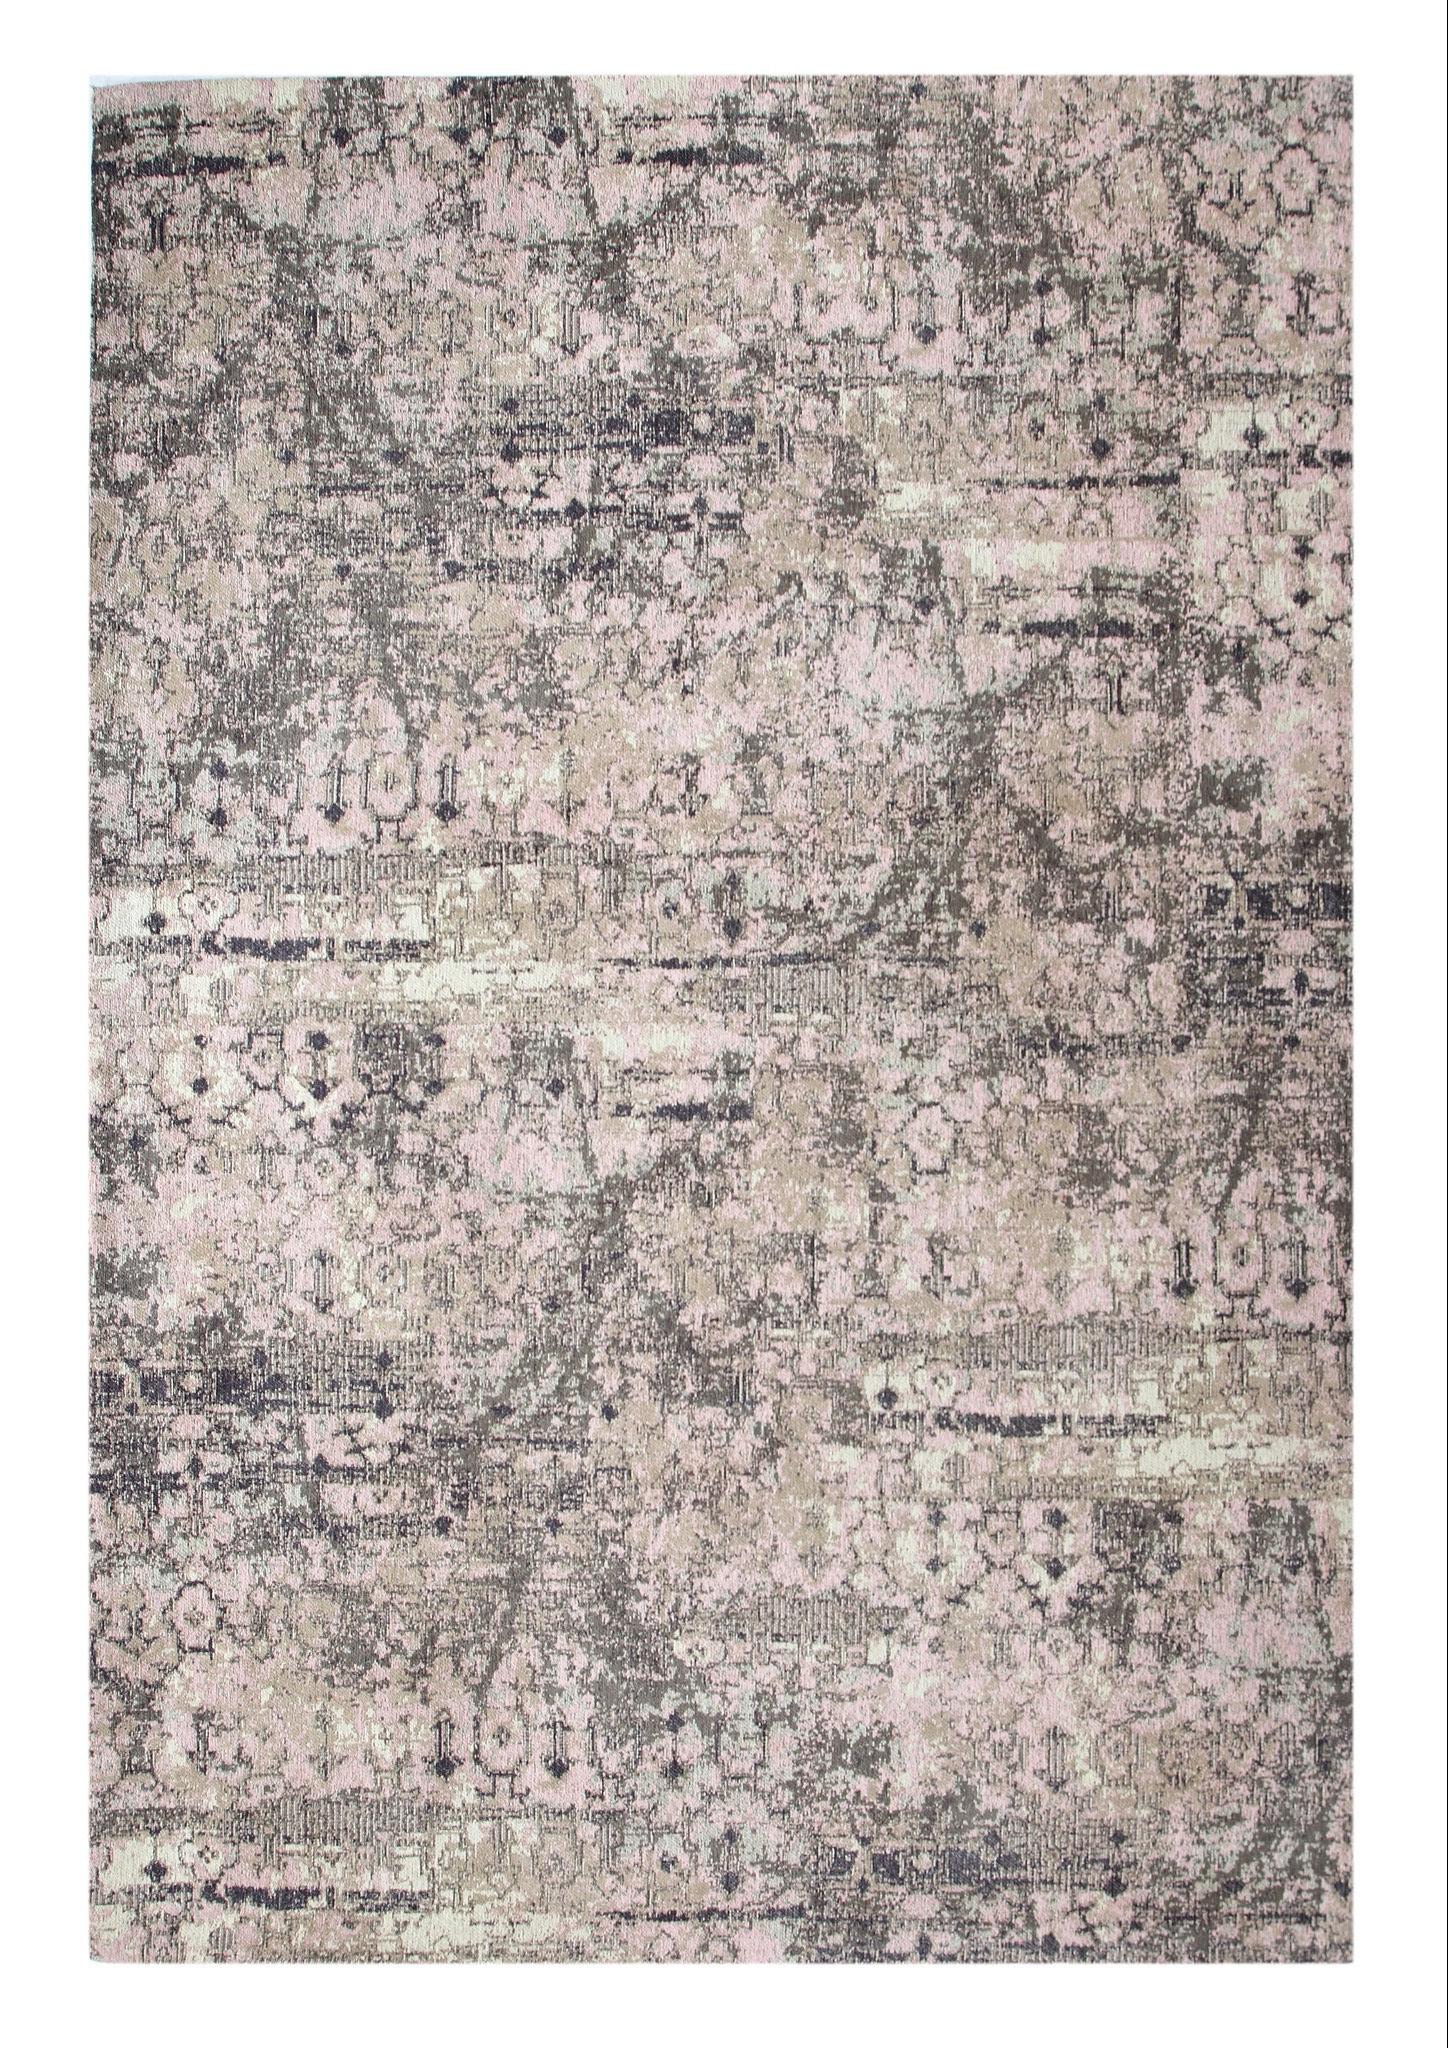 insurgent-grey-peach-rug2.jpg